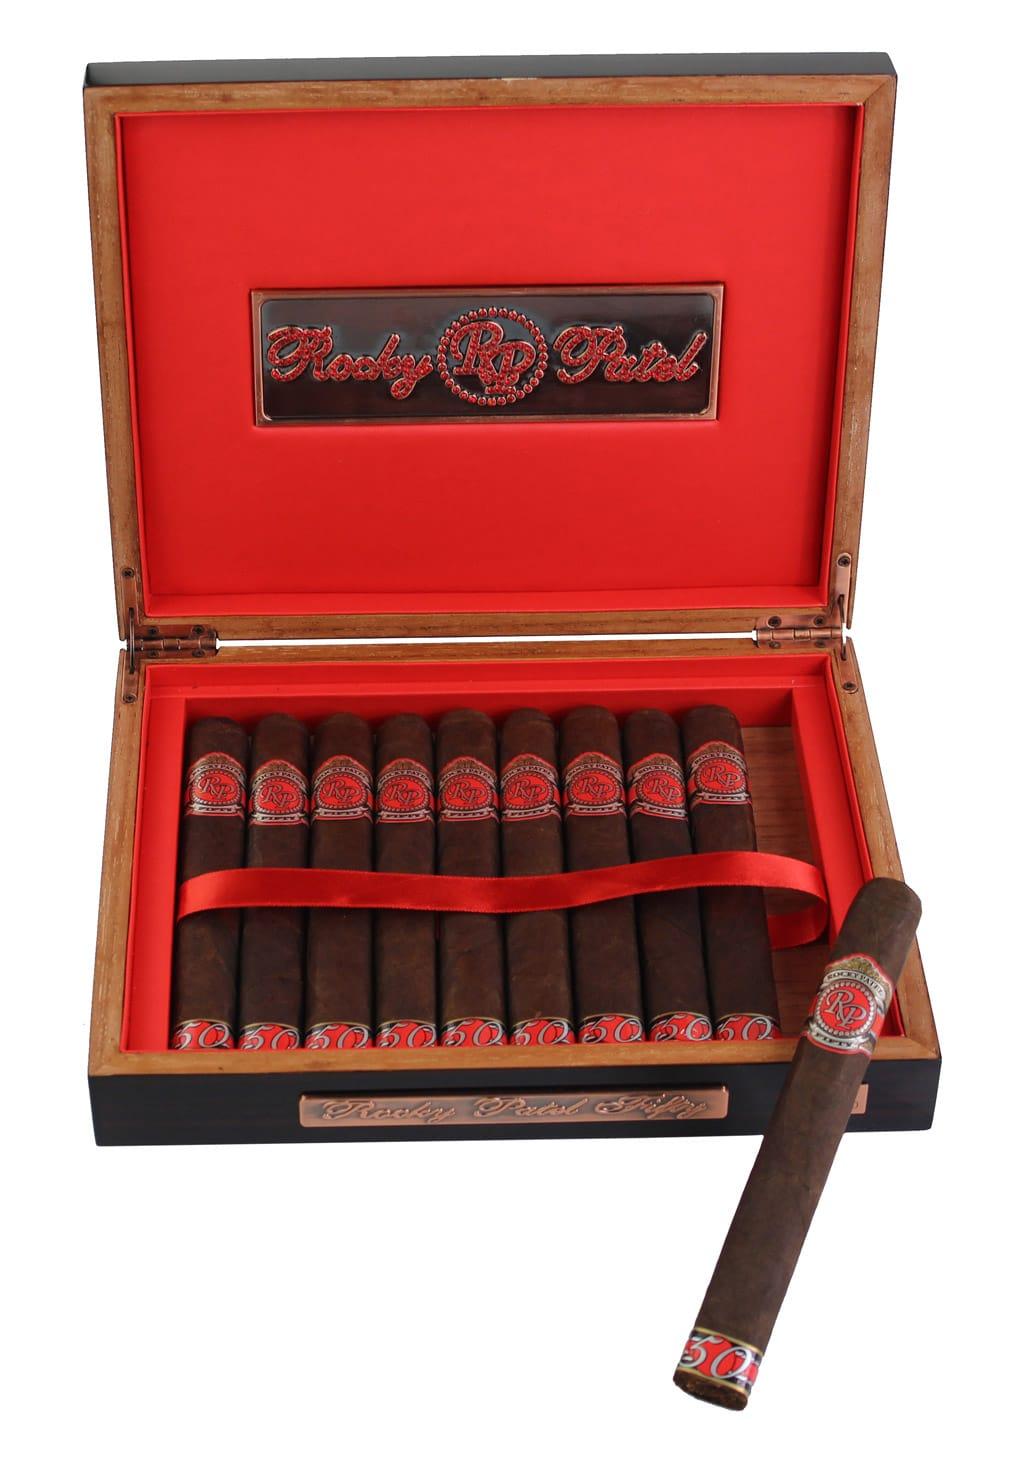 Rocky Patel Fifty 2017 cigar box open